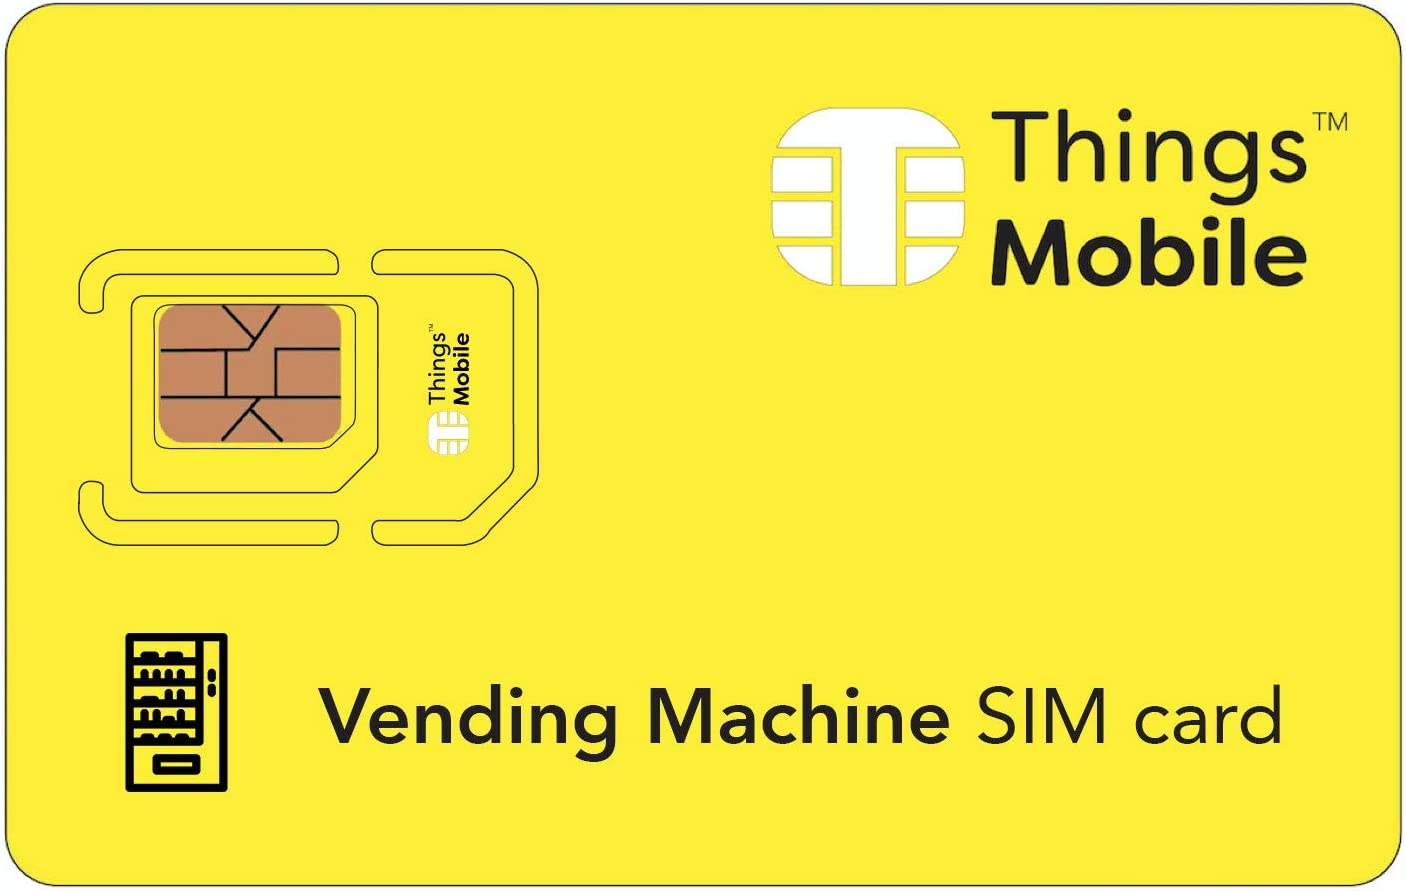 Tarjeta SIM para máquinas expendedoras / vending machines - GSM / 2G / 3G / 4G con un crédito incluido de 10 €